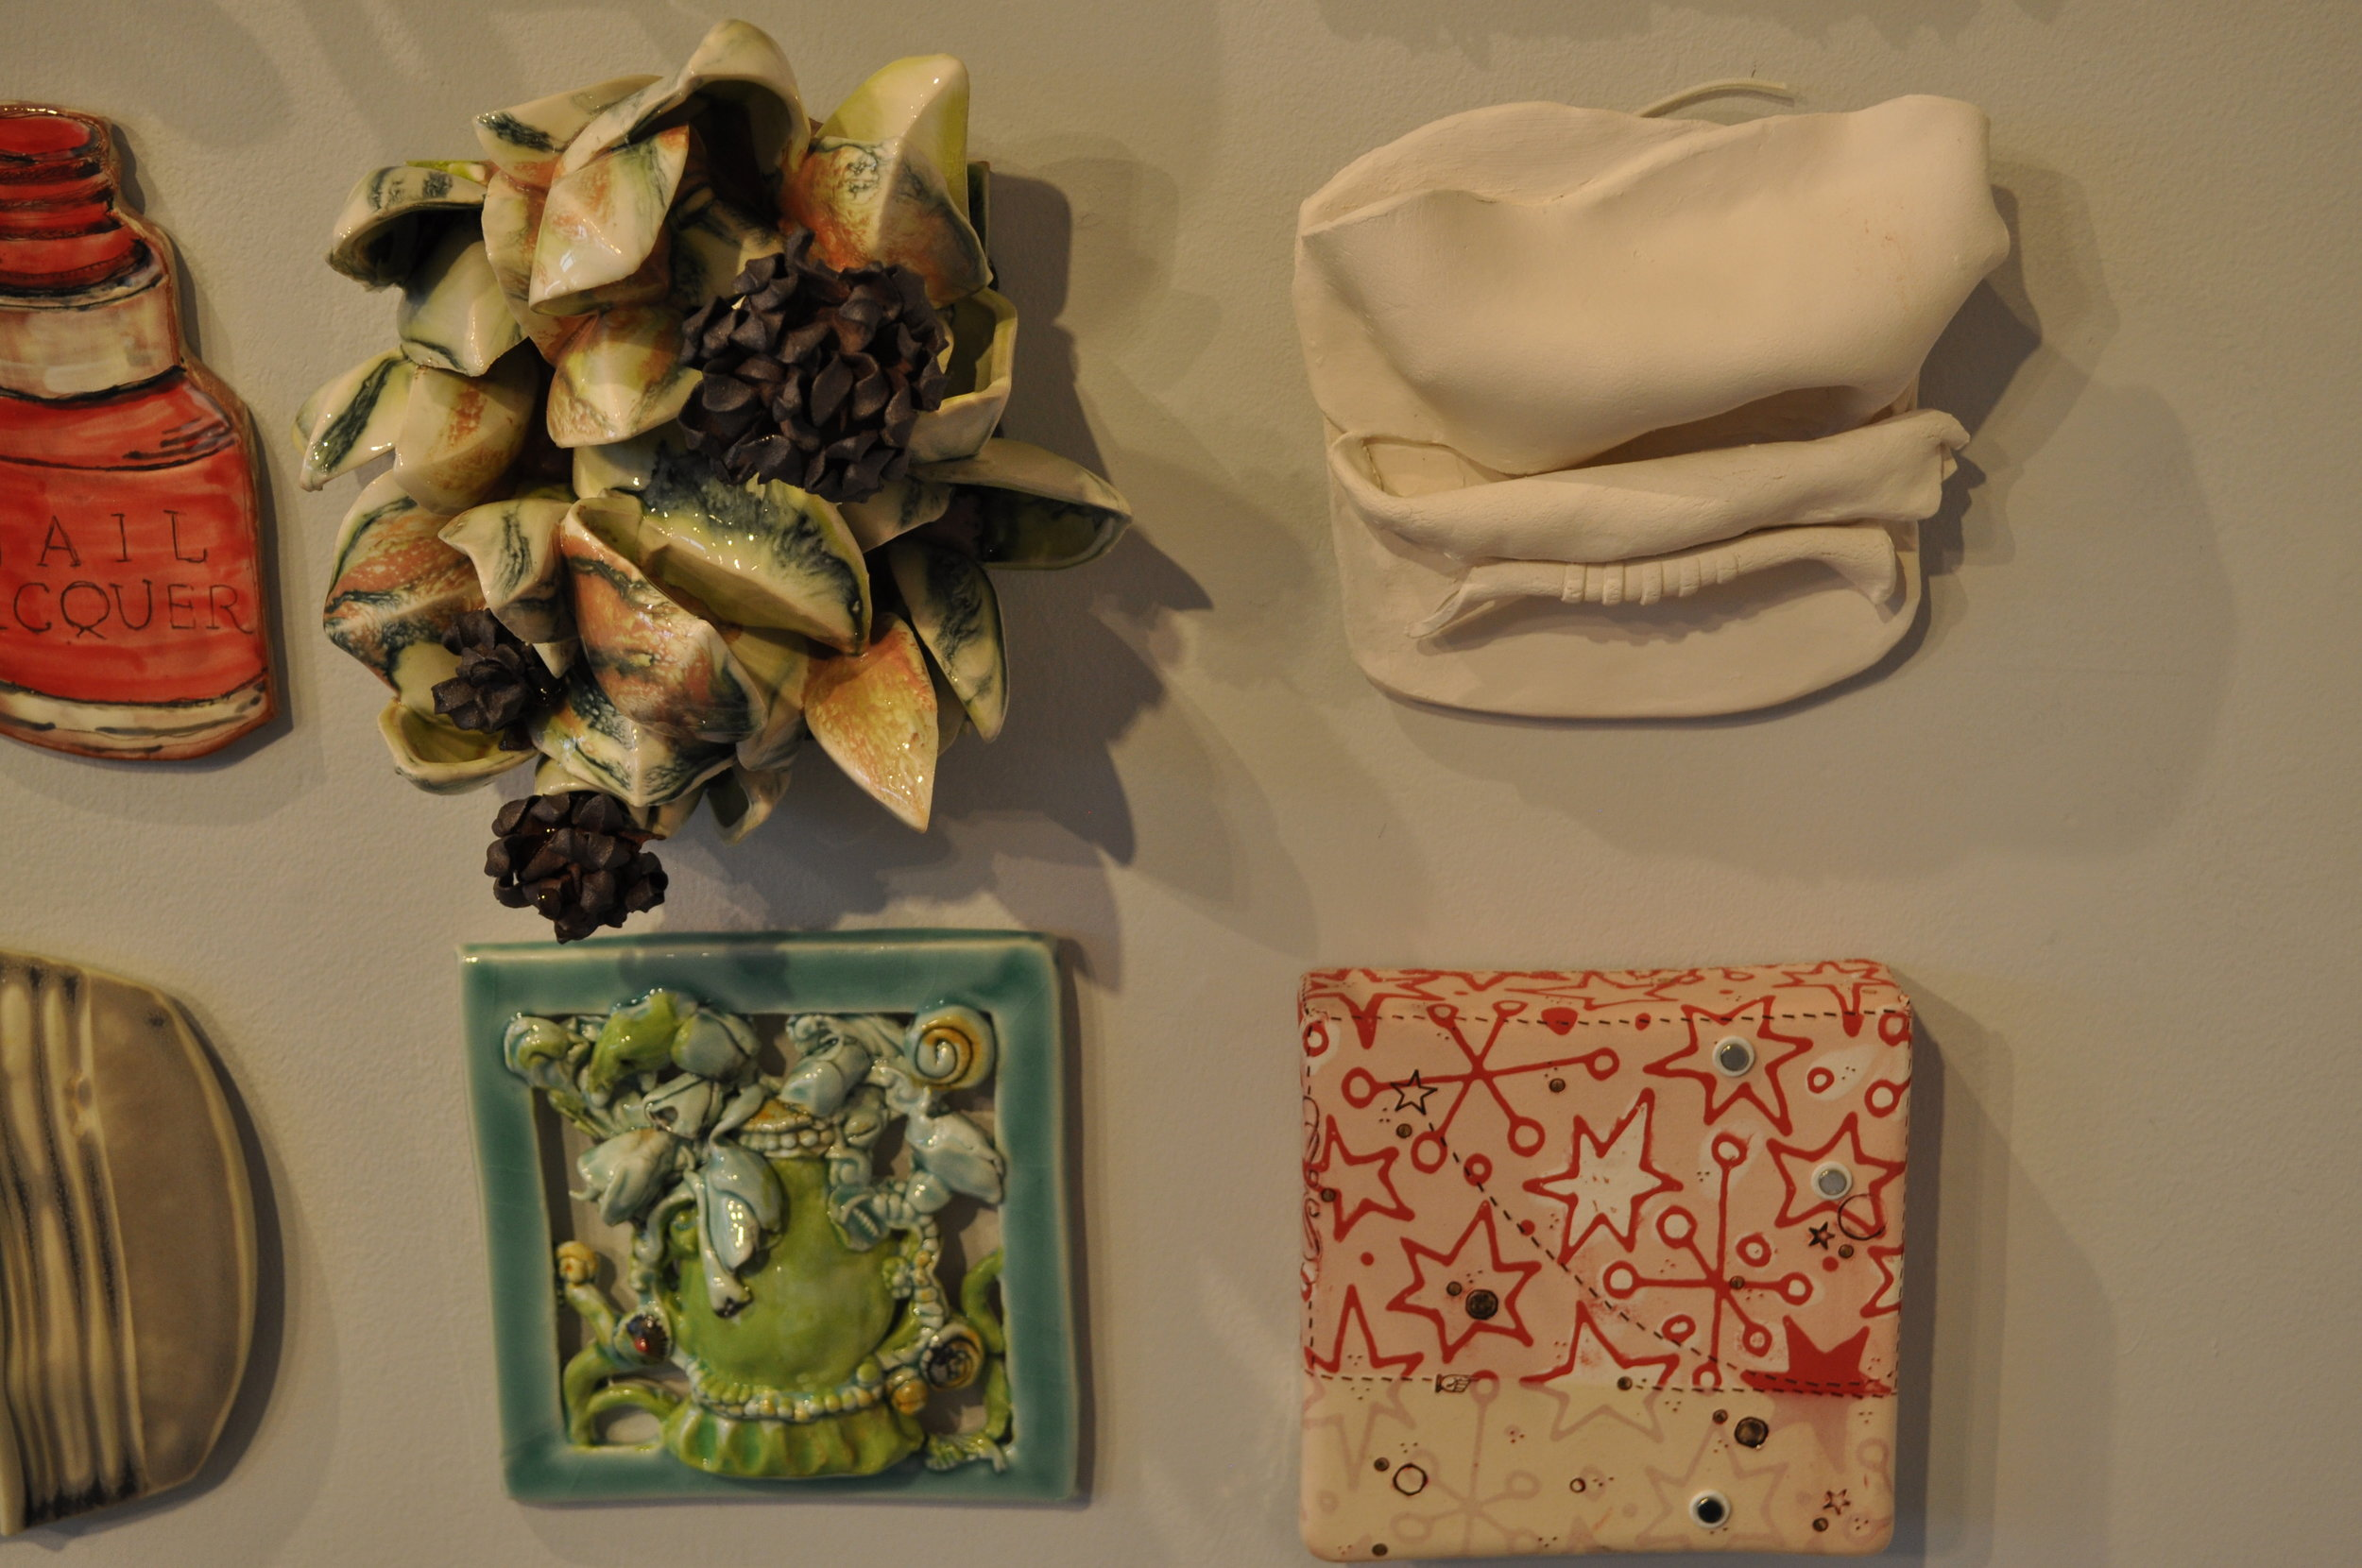 1.  Susan Beiner,  Leaf Tile #3  $175  2.  Luanne Morse,  Old Pond  $50  3.  Susan Wortman,  Untitled $425  4.    Jason Burnett,  Star Light/ Star Bright  $125